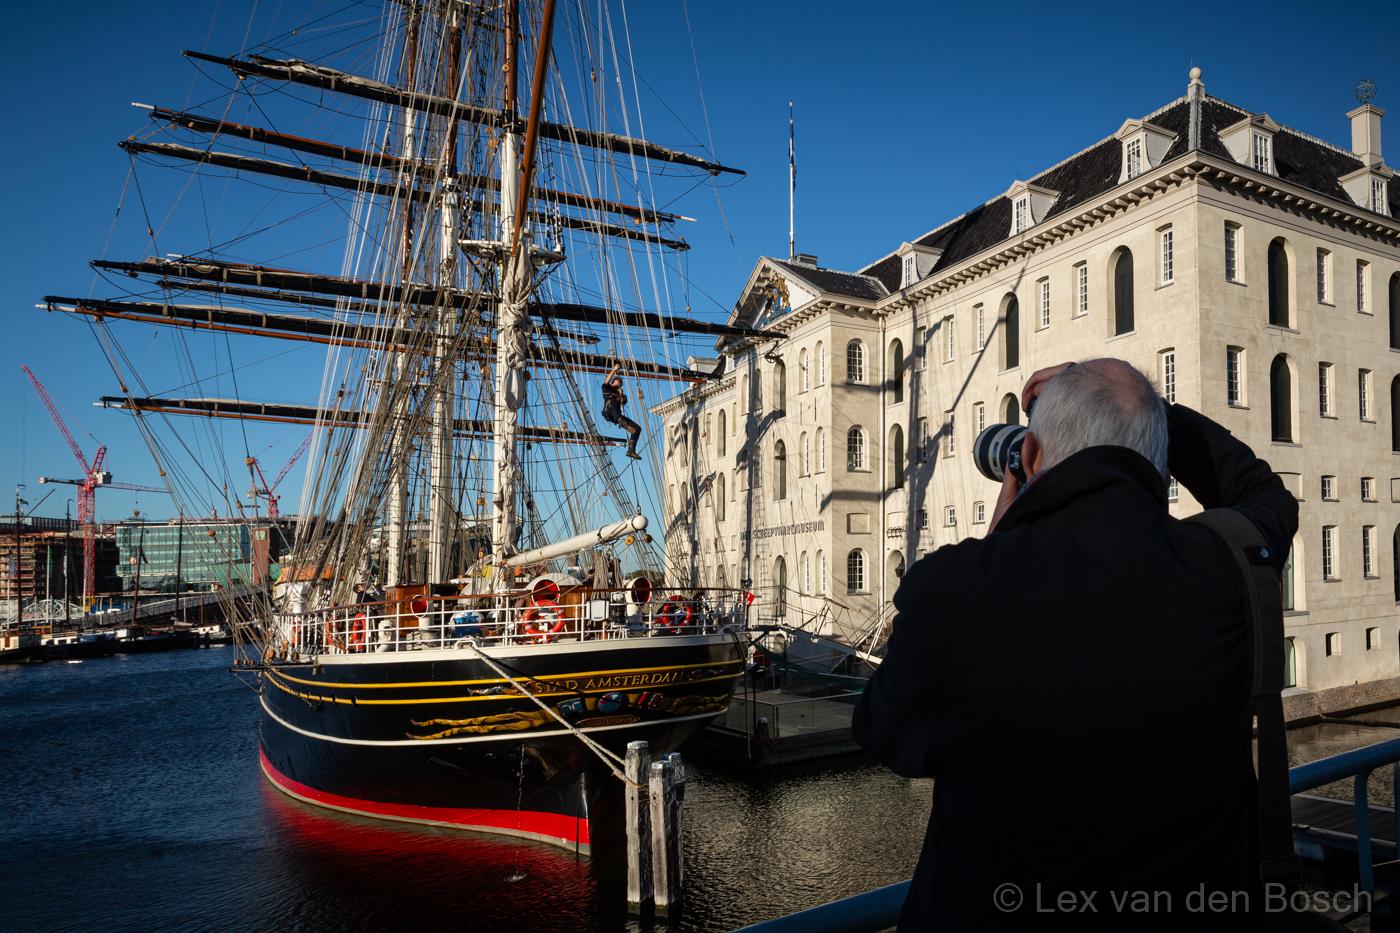 Fotowandeling Amsterdam-Centrum: Architectuur & Zeevaardij